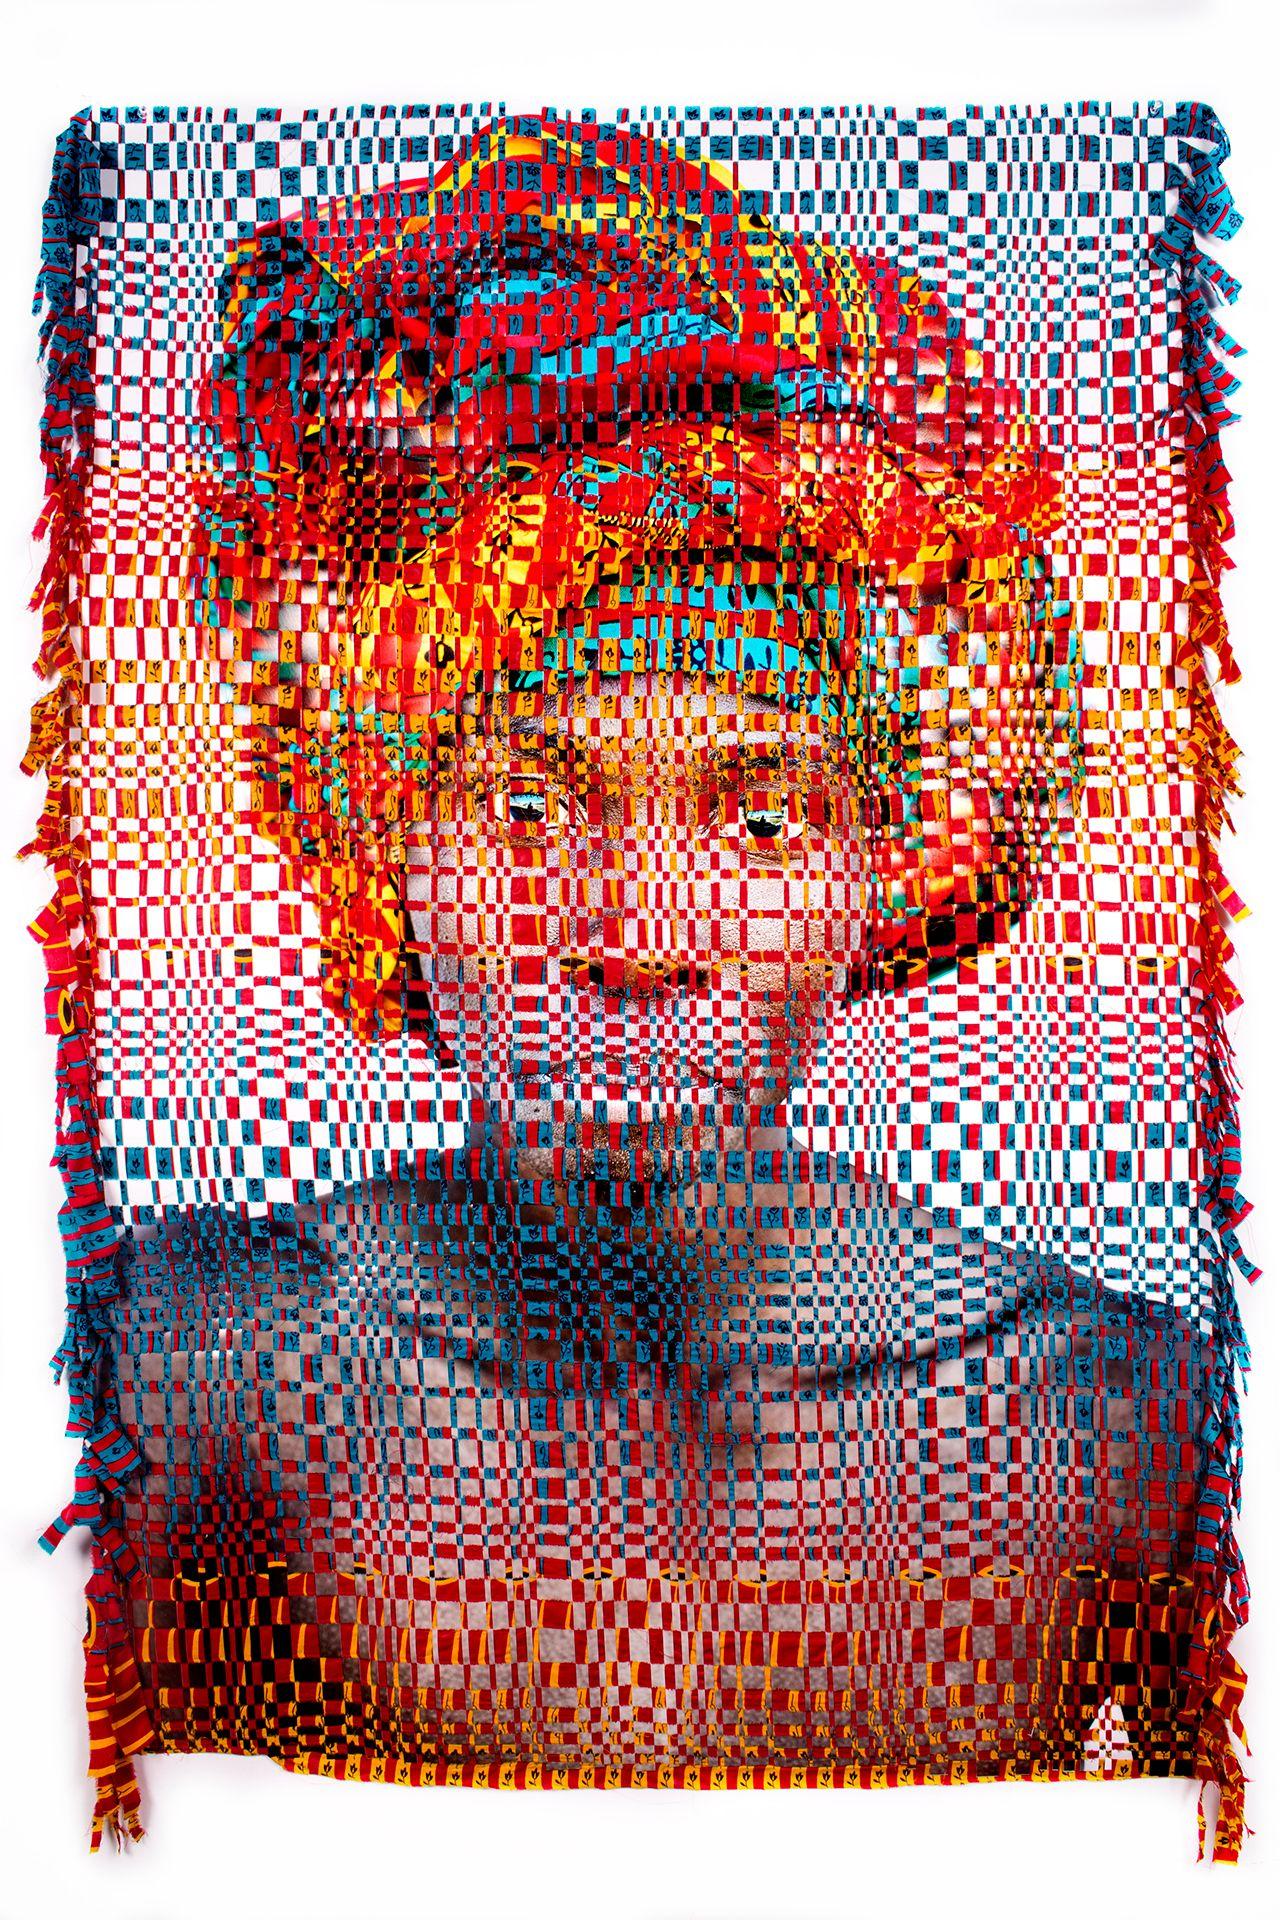 Kyle-Meyer-series1.-Interwoven-imageno.25-Unidentified105.jpg